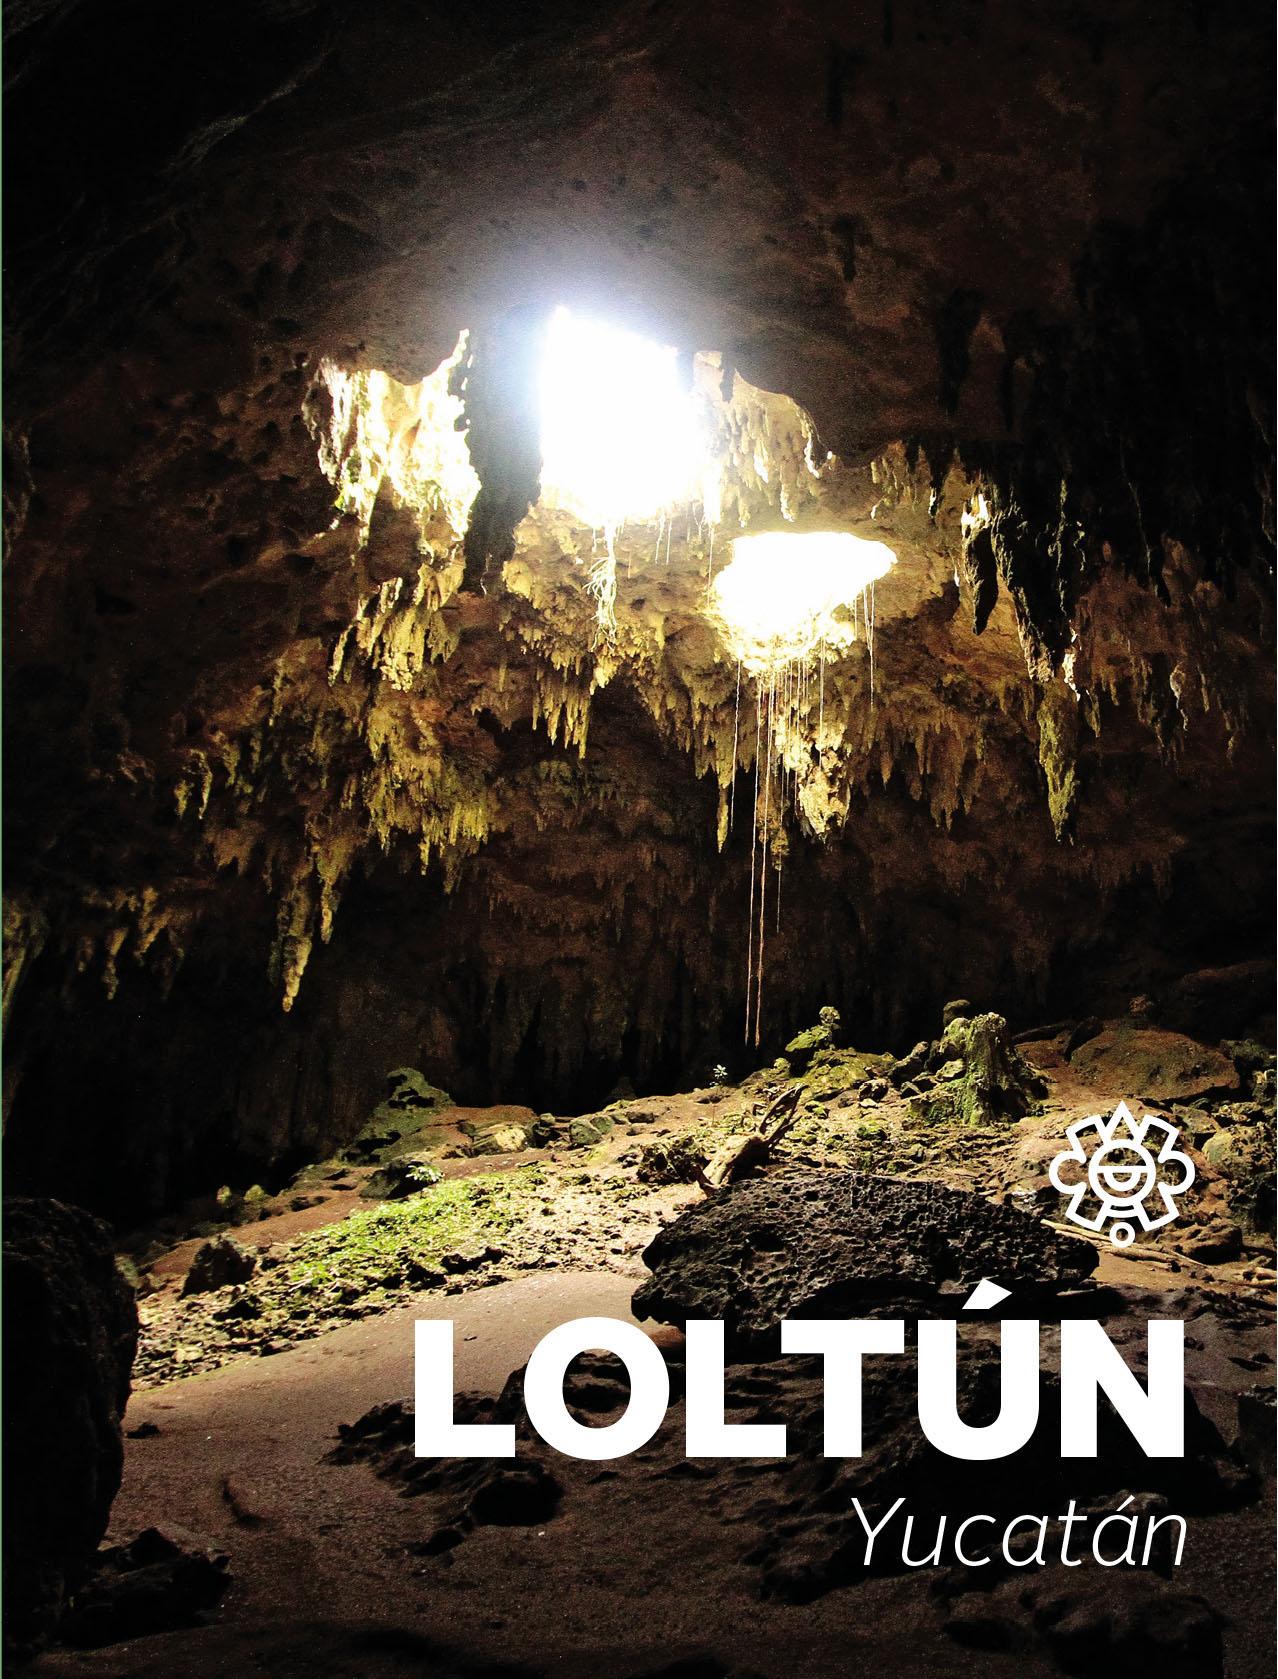 Loltún